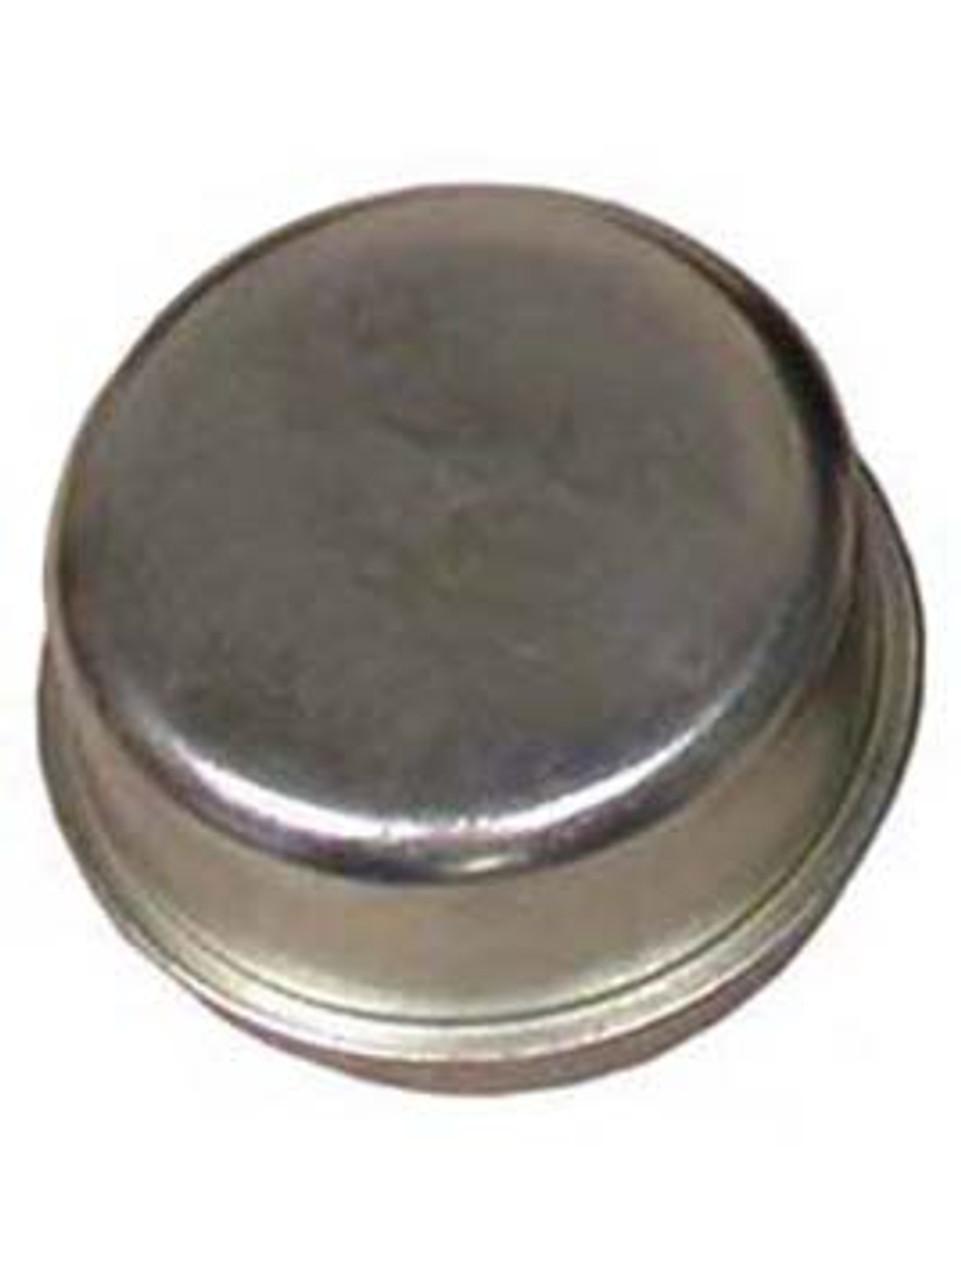 "DC225 --- Dust Cap - 2.33"" Outer Diameter"